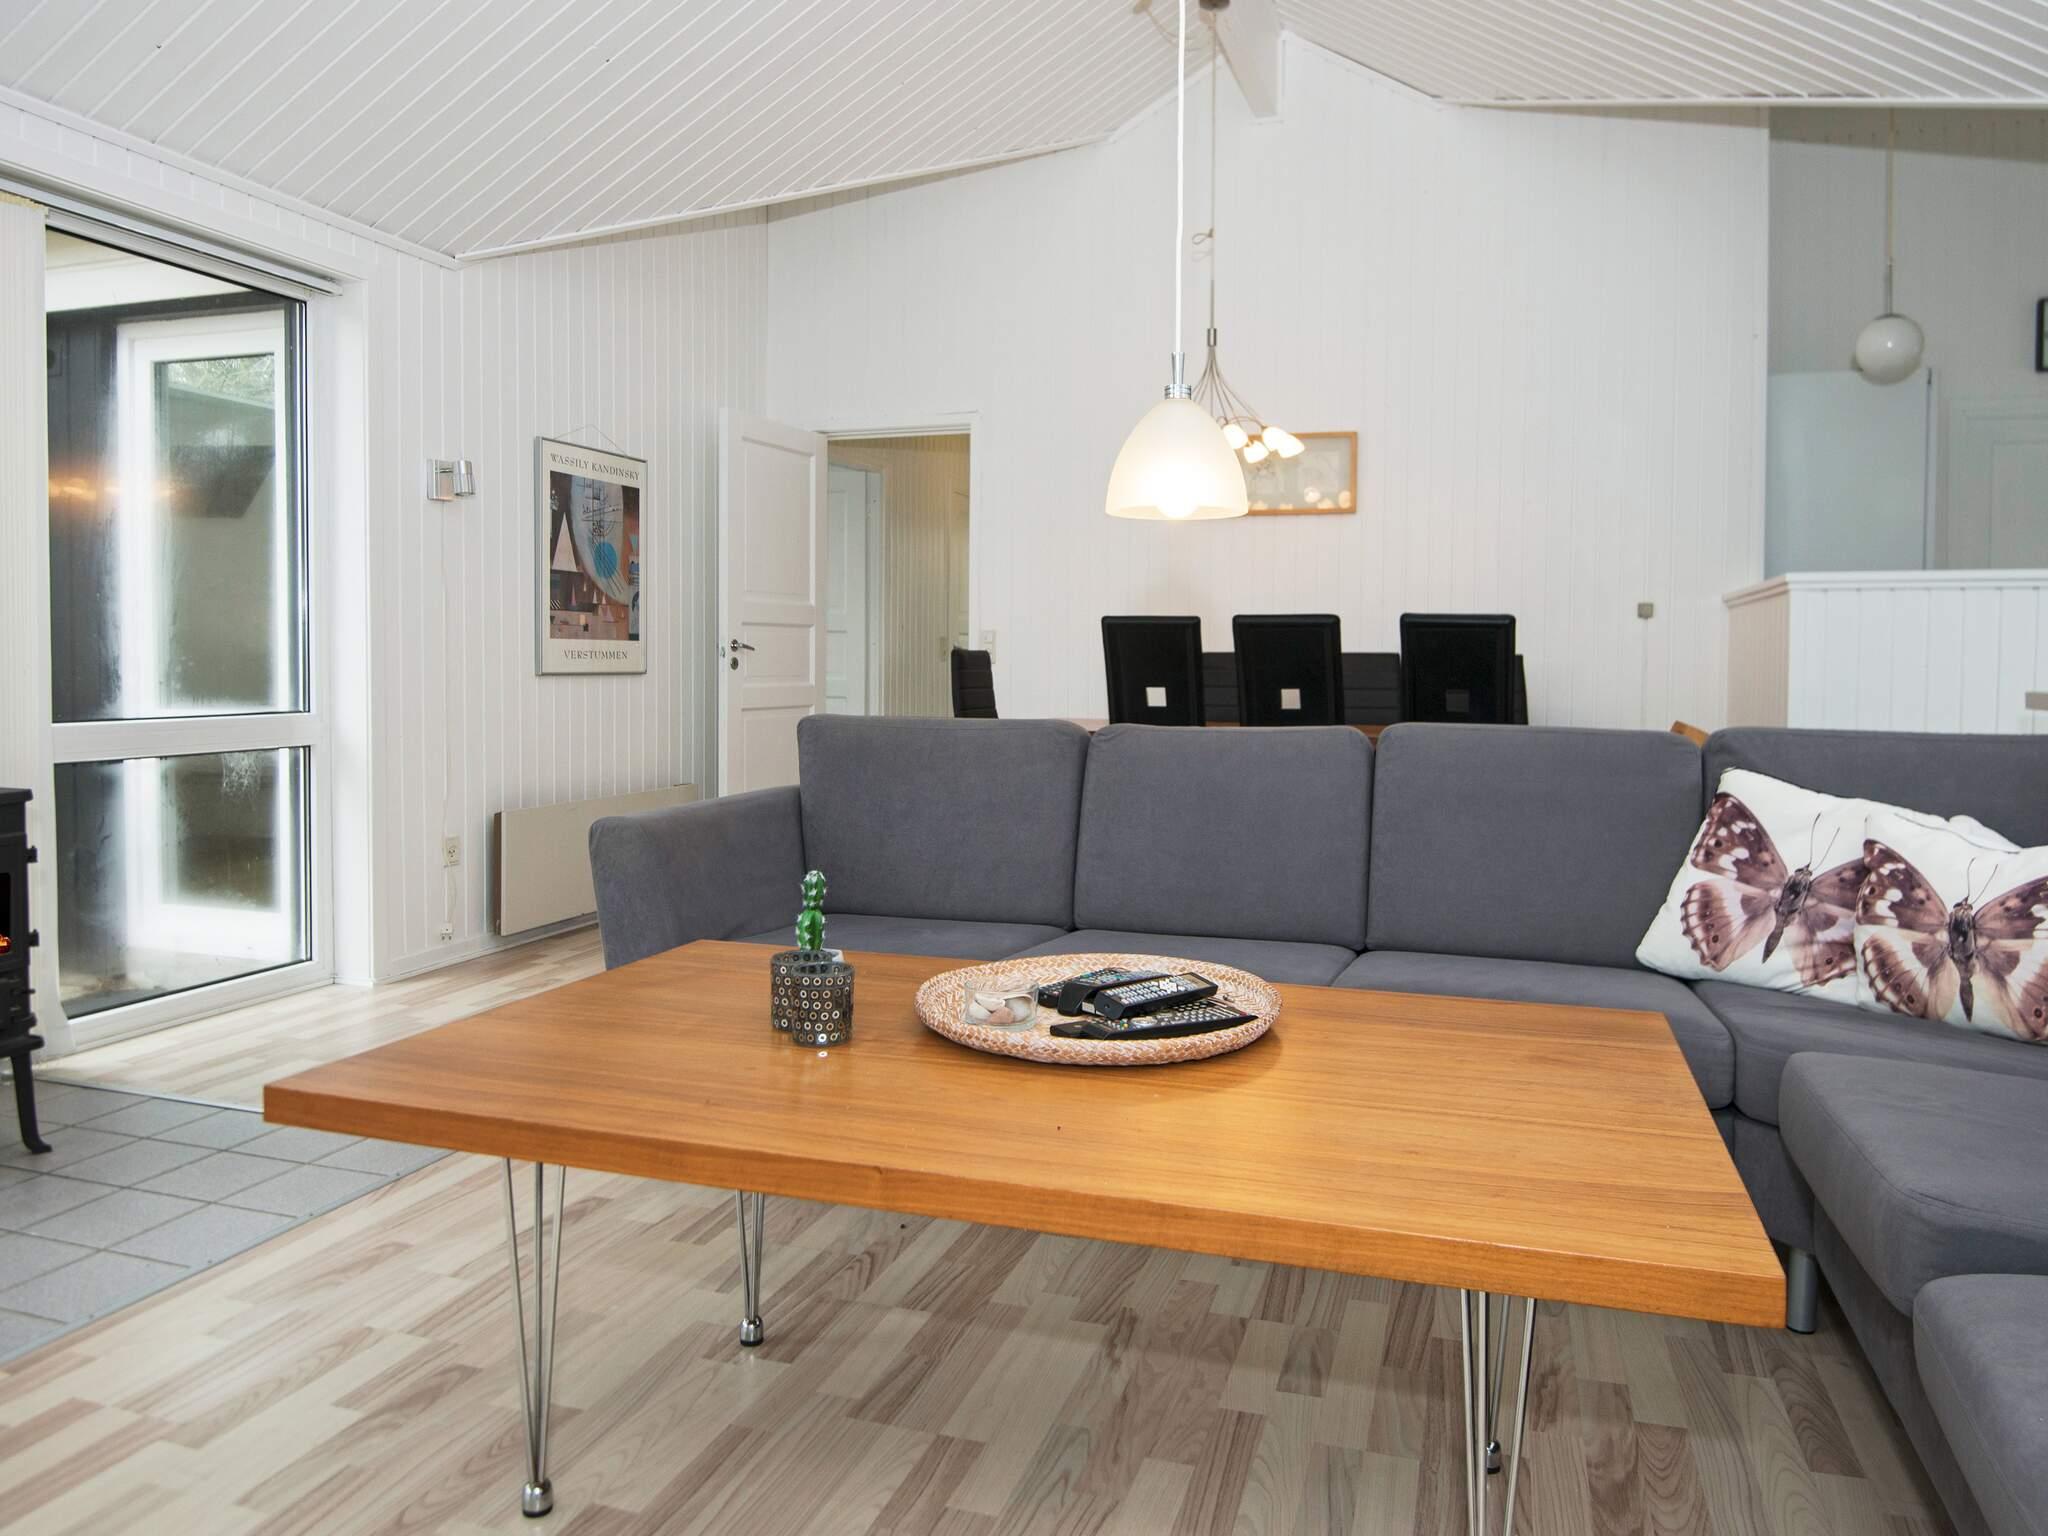 Ferienhaus Lyngsbæk Strand (493348), Ebeltoft, , Ostjütland, Dänemark, Bild 3